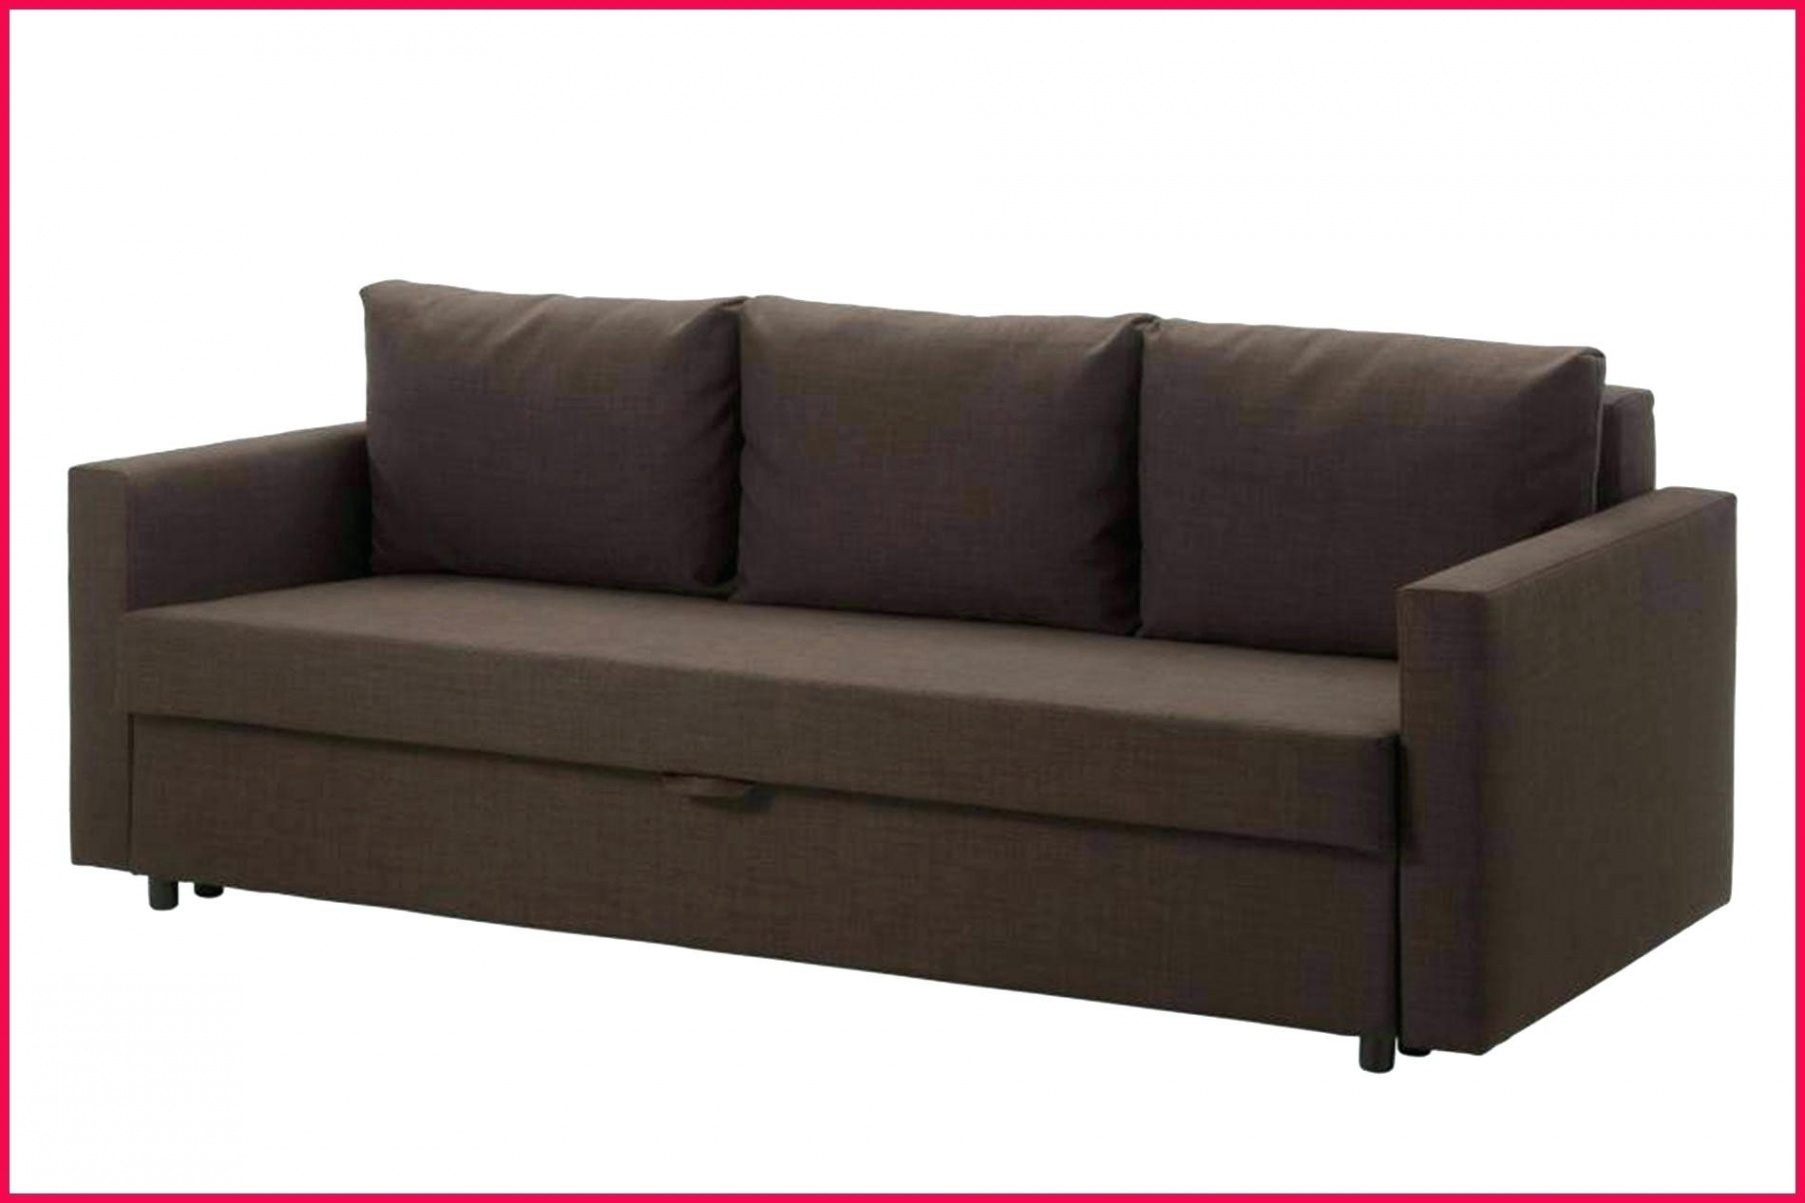 Canapé Convertible Angle Ikea Impressionnant Images Canapé 3 Places Cuir — Laguerredesmots